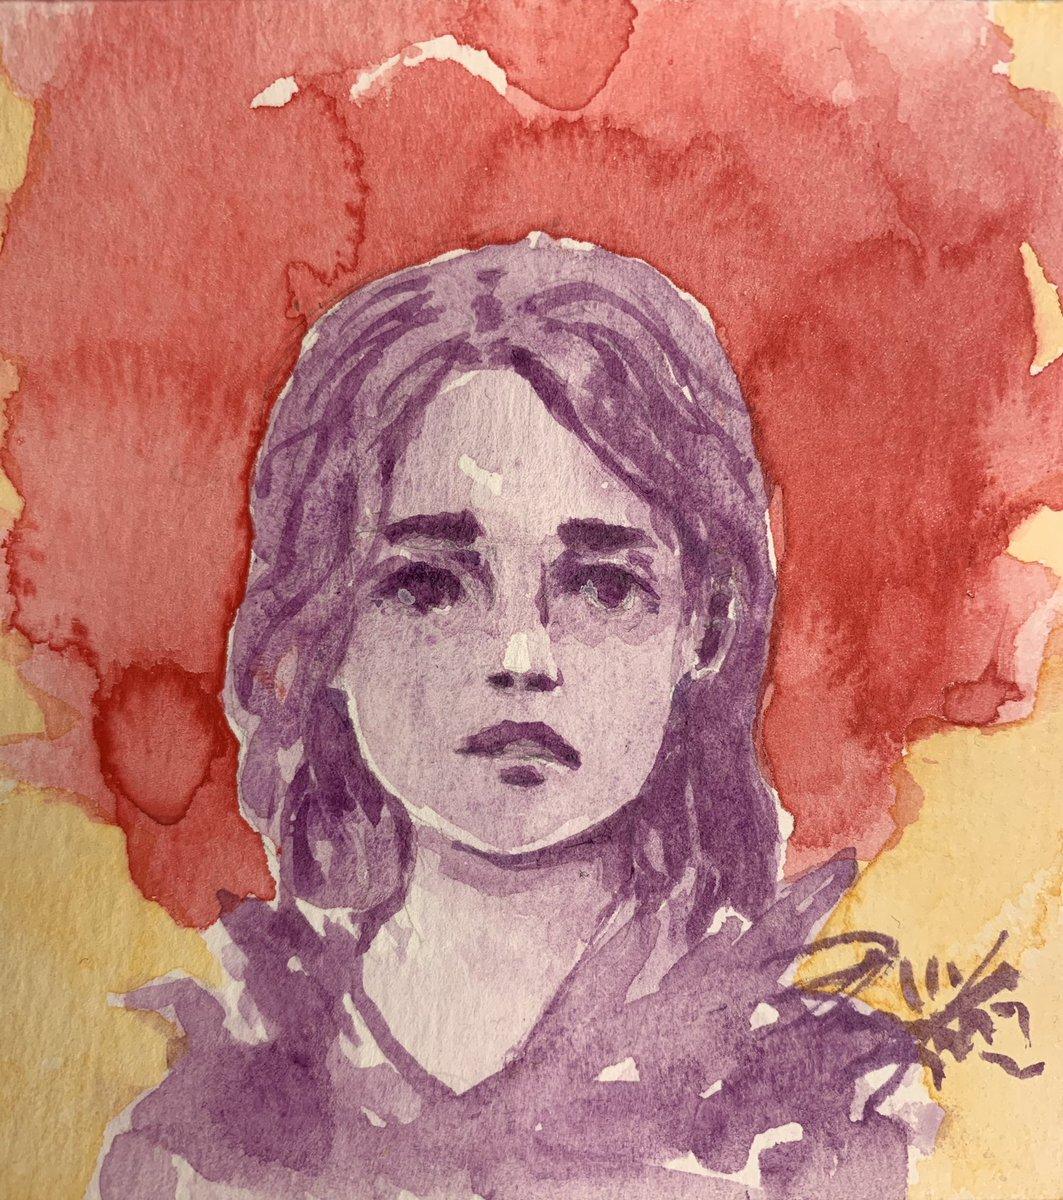 """Longing.""   #OsoAstral #Art #Mixedmedia #Painting #Drawing #Watercolor #Ink #Graphite #Gouache #InstaArtist #TexasArtist #ElPasoArtist #ElPasoStrong #Schmincke #Winsorandnewtonpic.twitter.com/H9bRQDoddb"